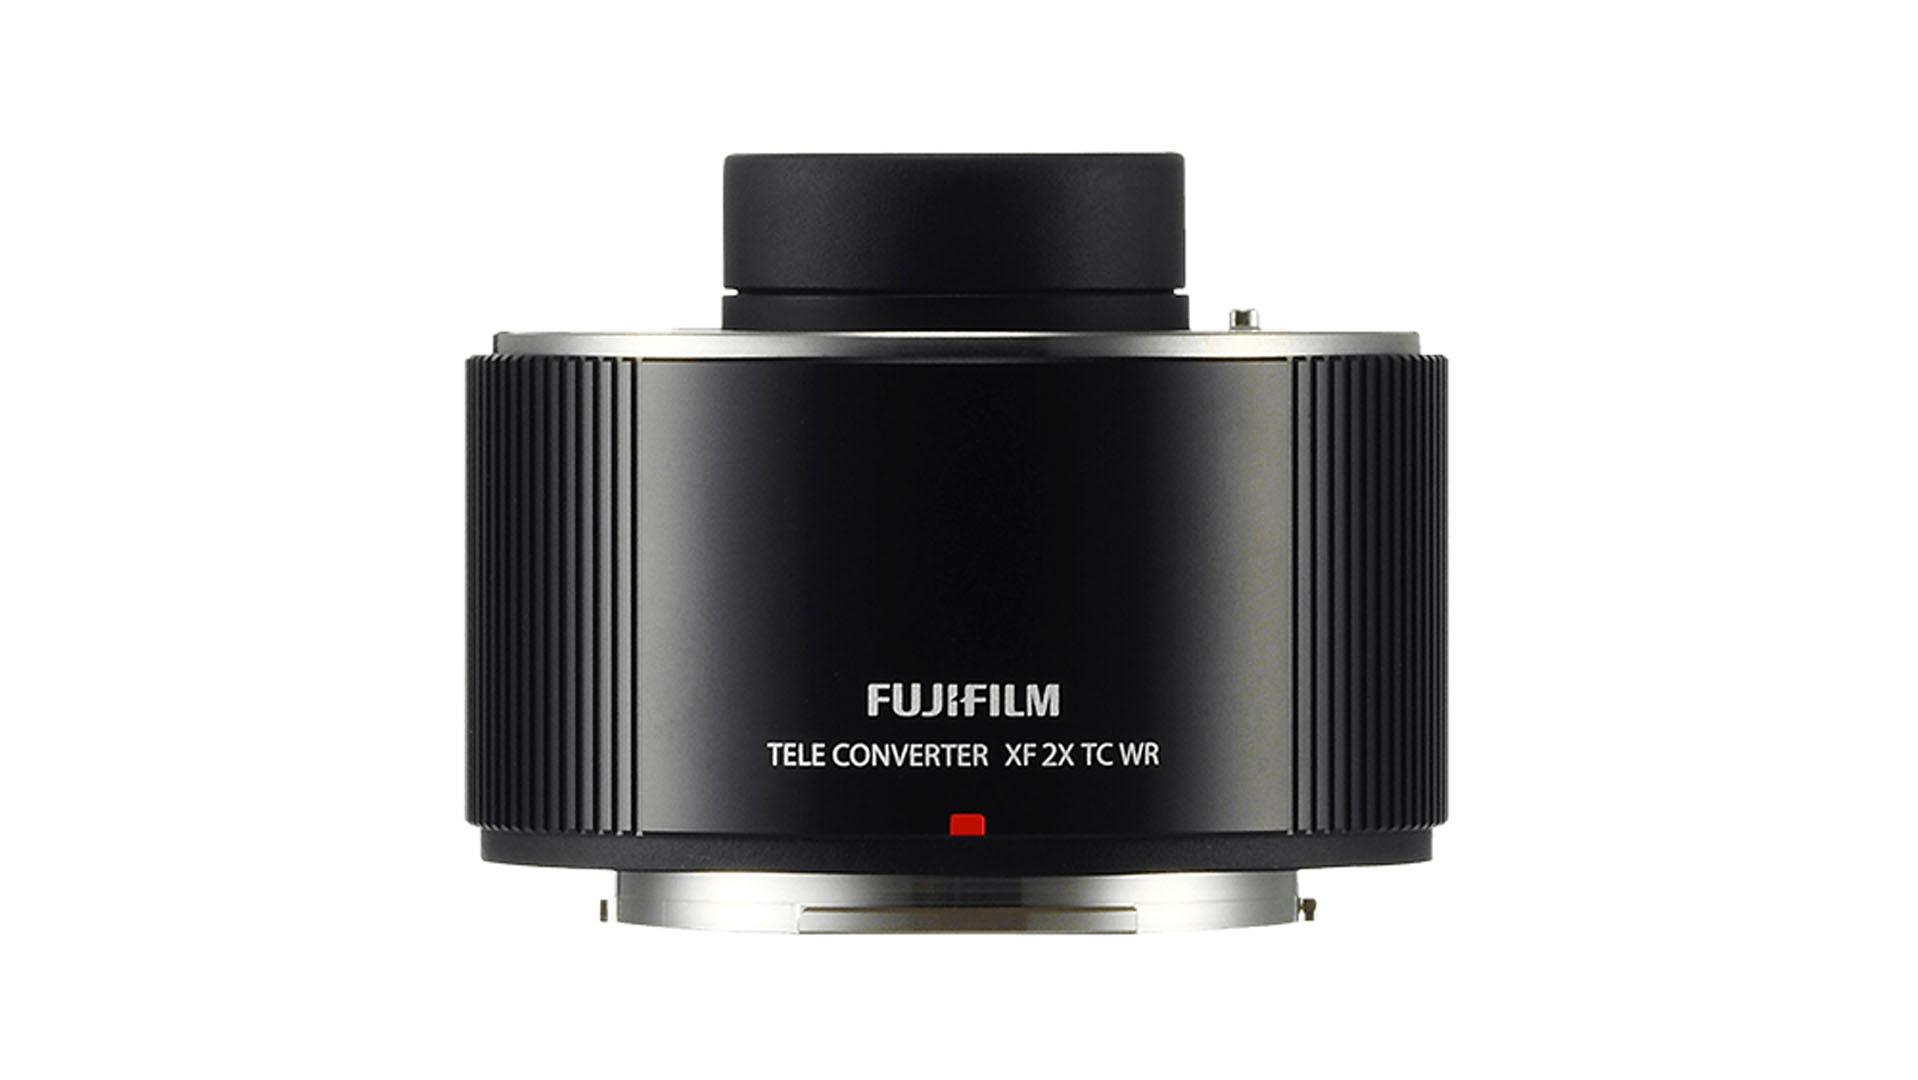 fujifilm teleconverter packshot